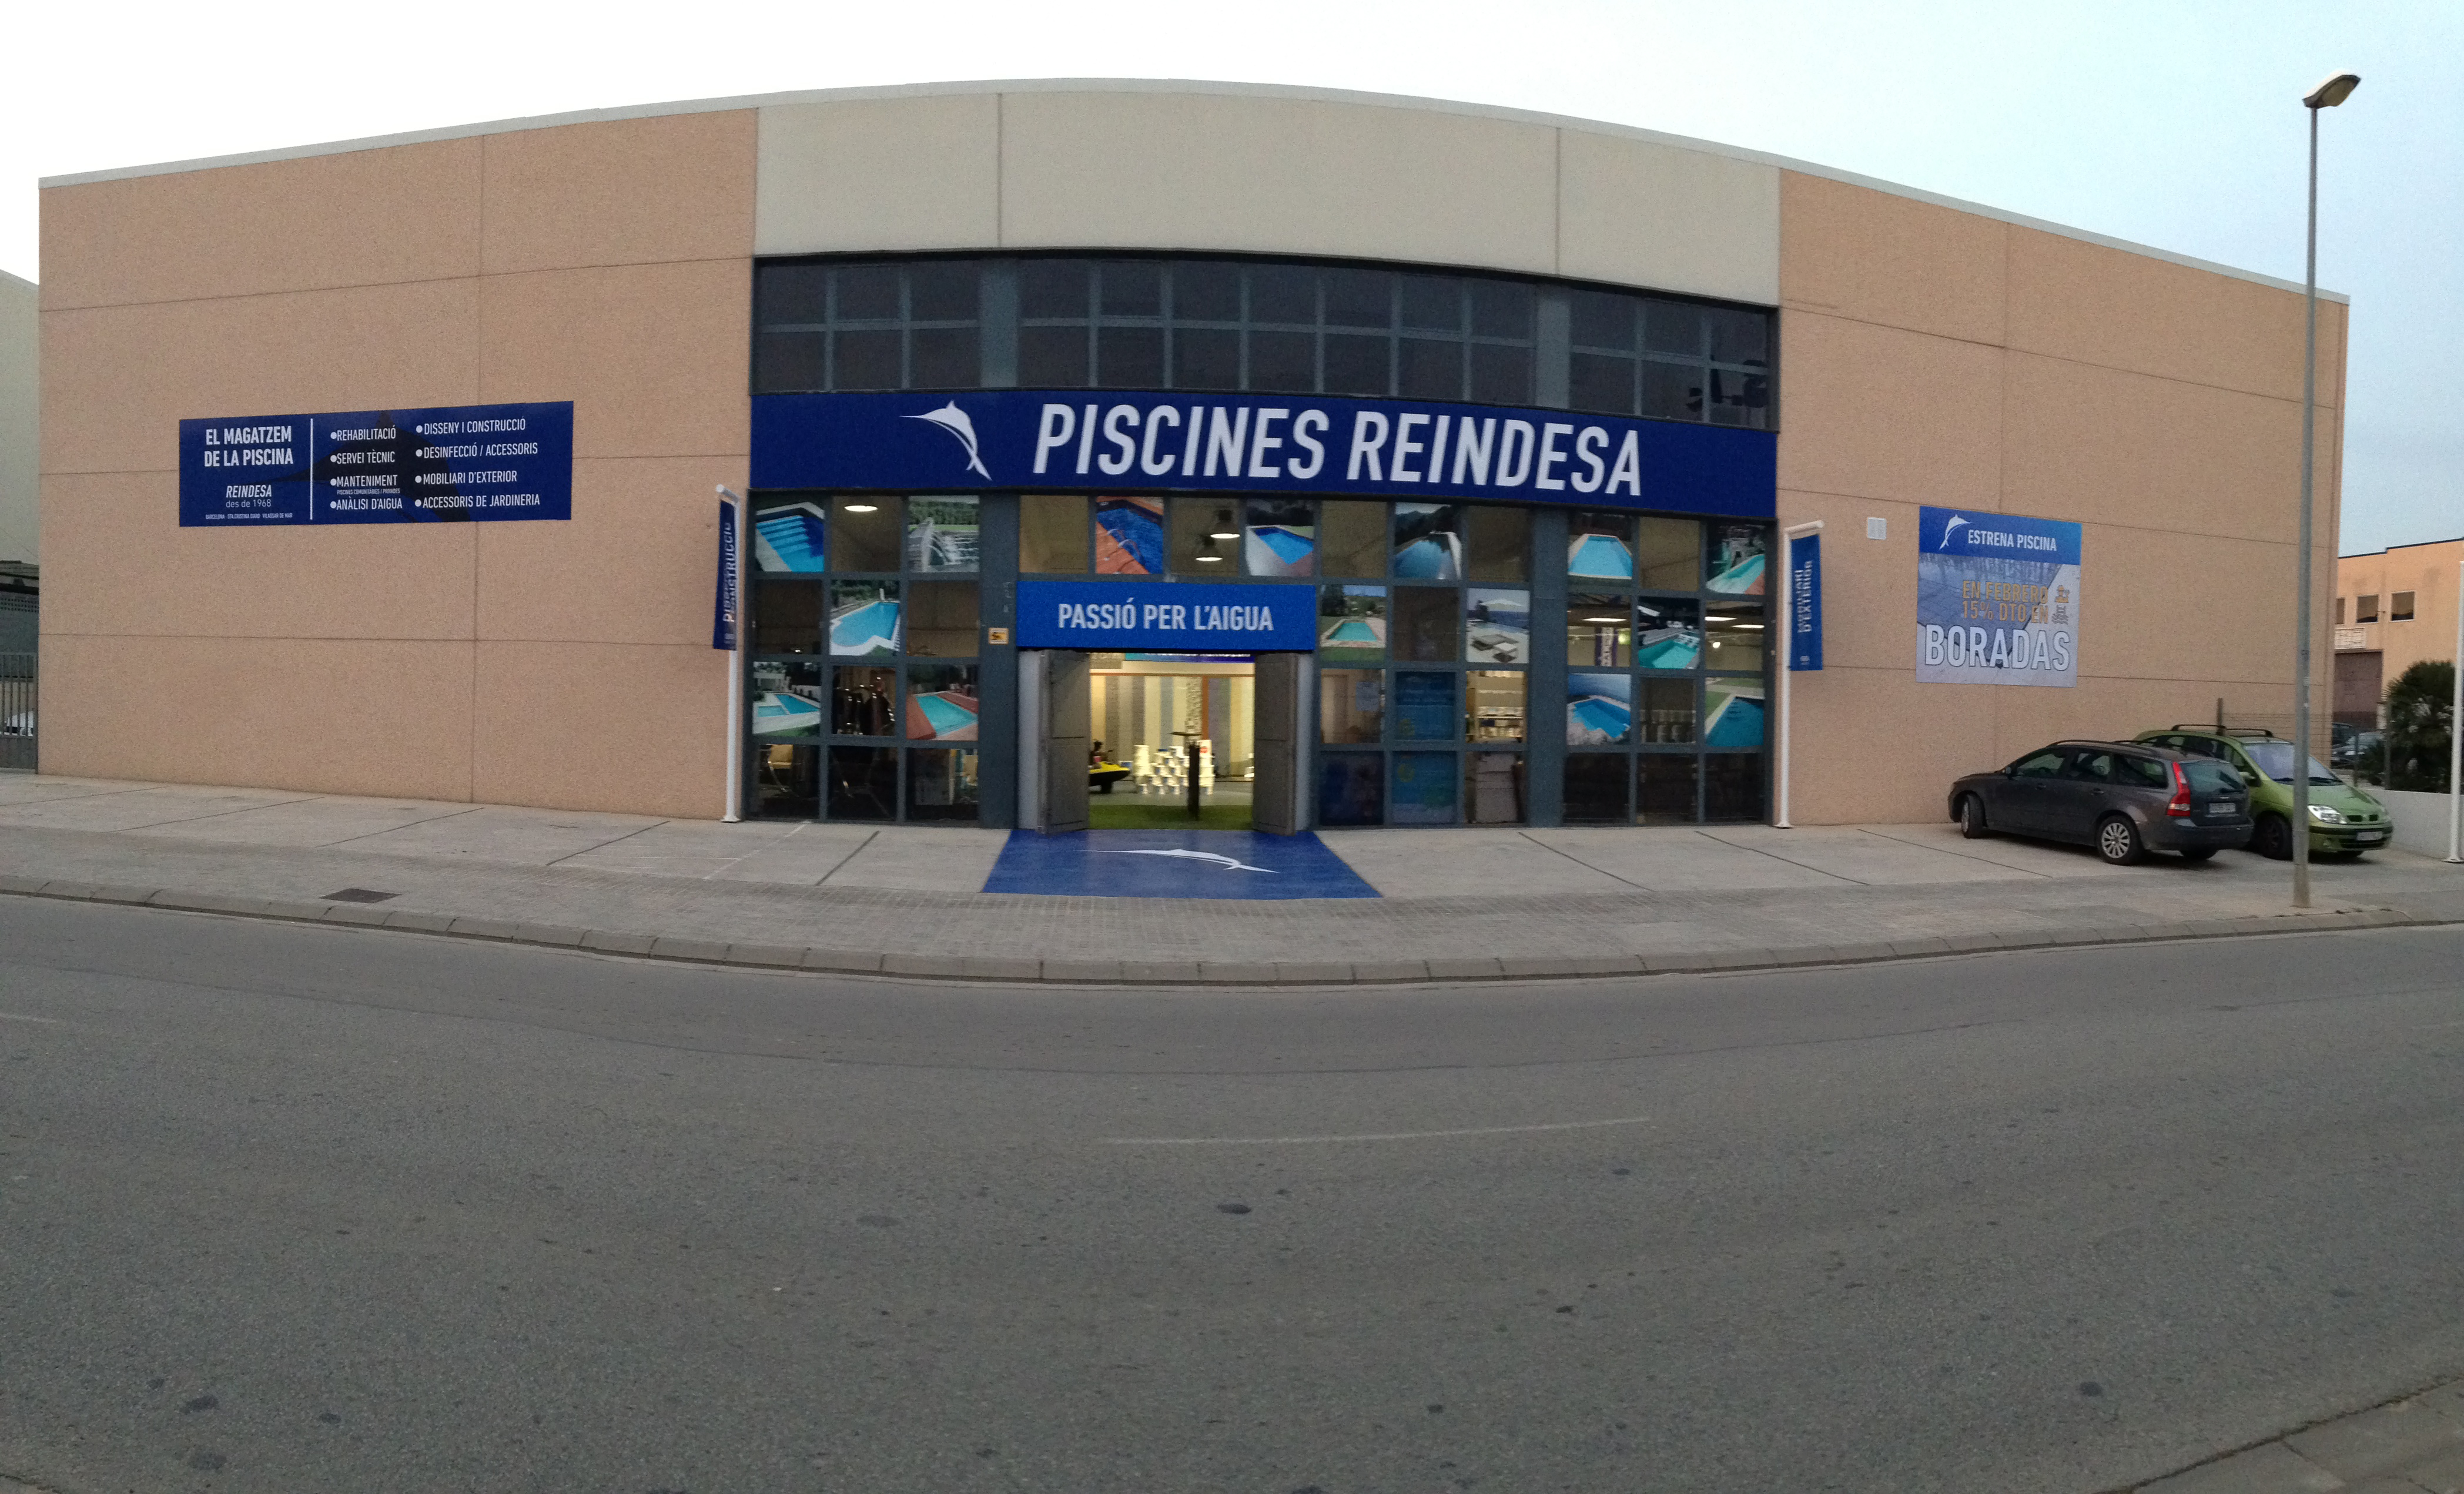 Reindesa Vilassar de Mar